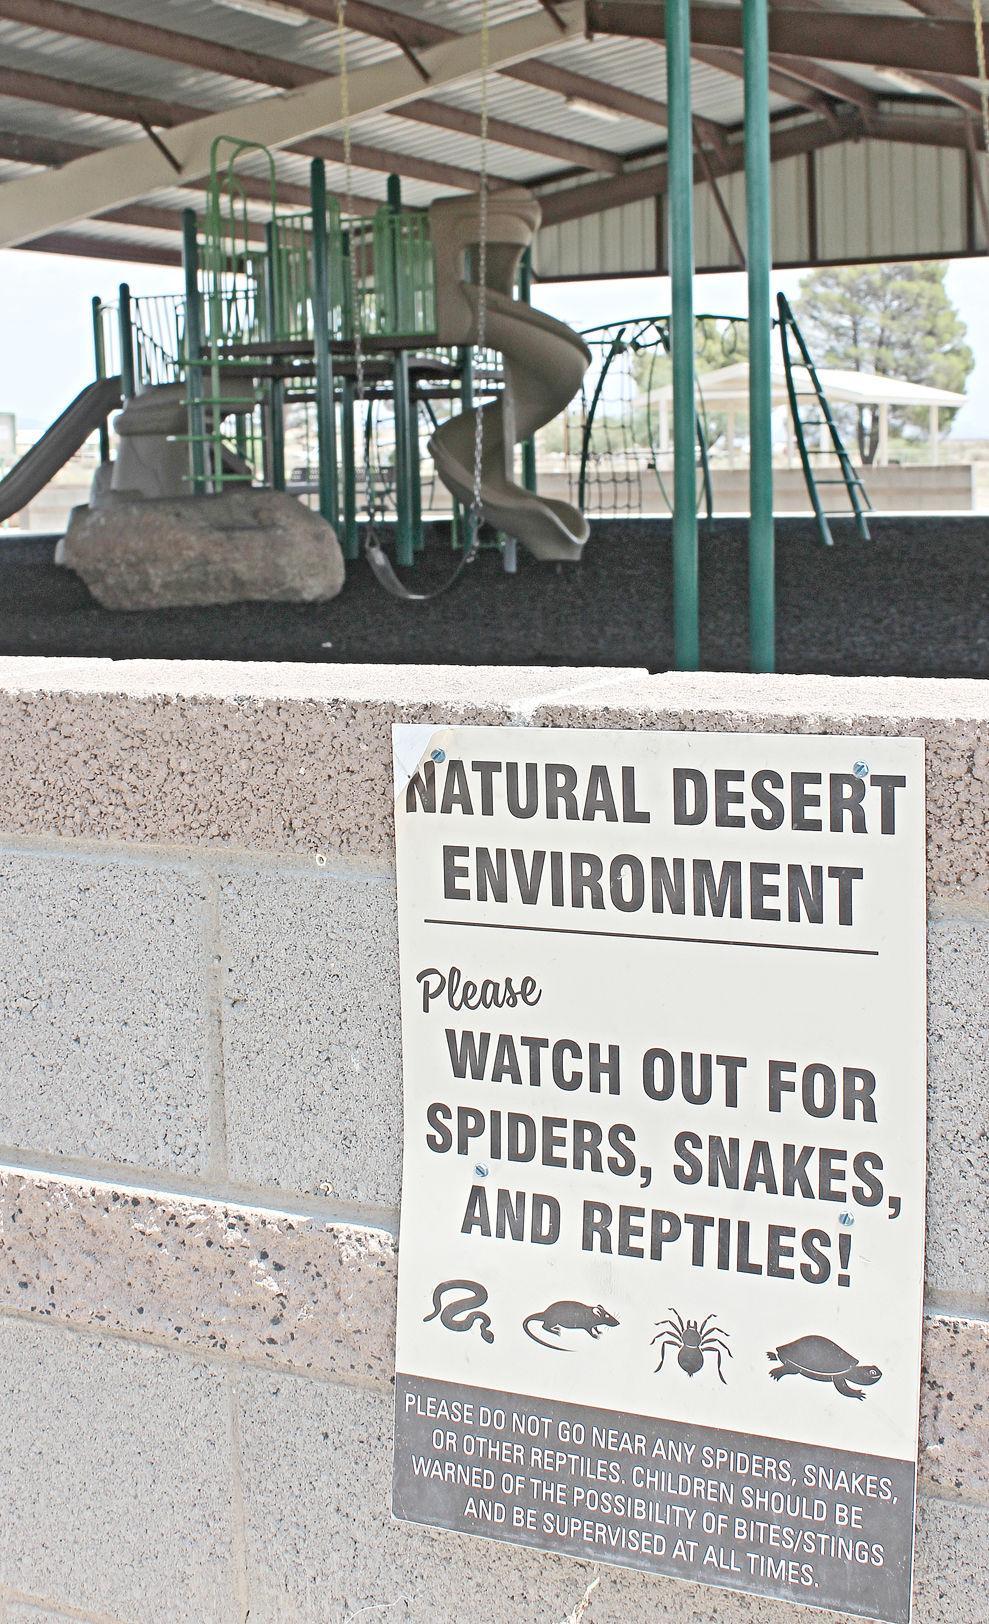 Fairgrounds warning